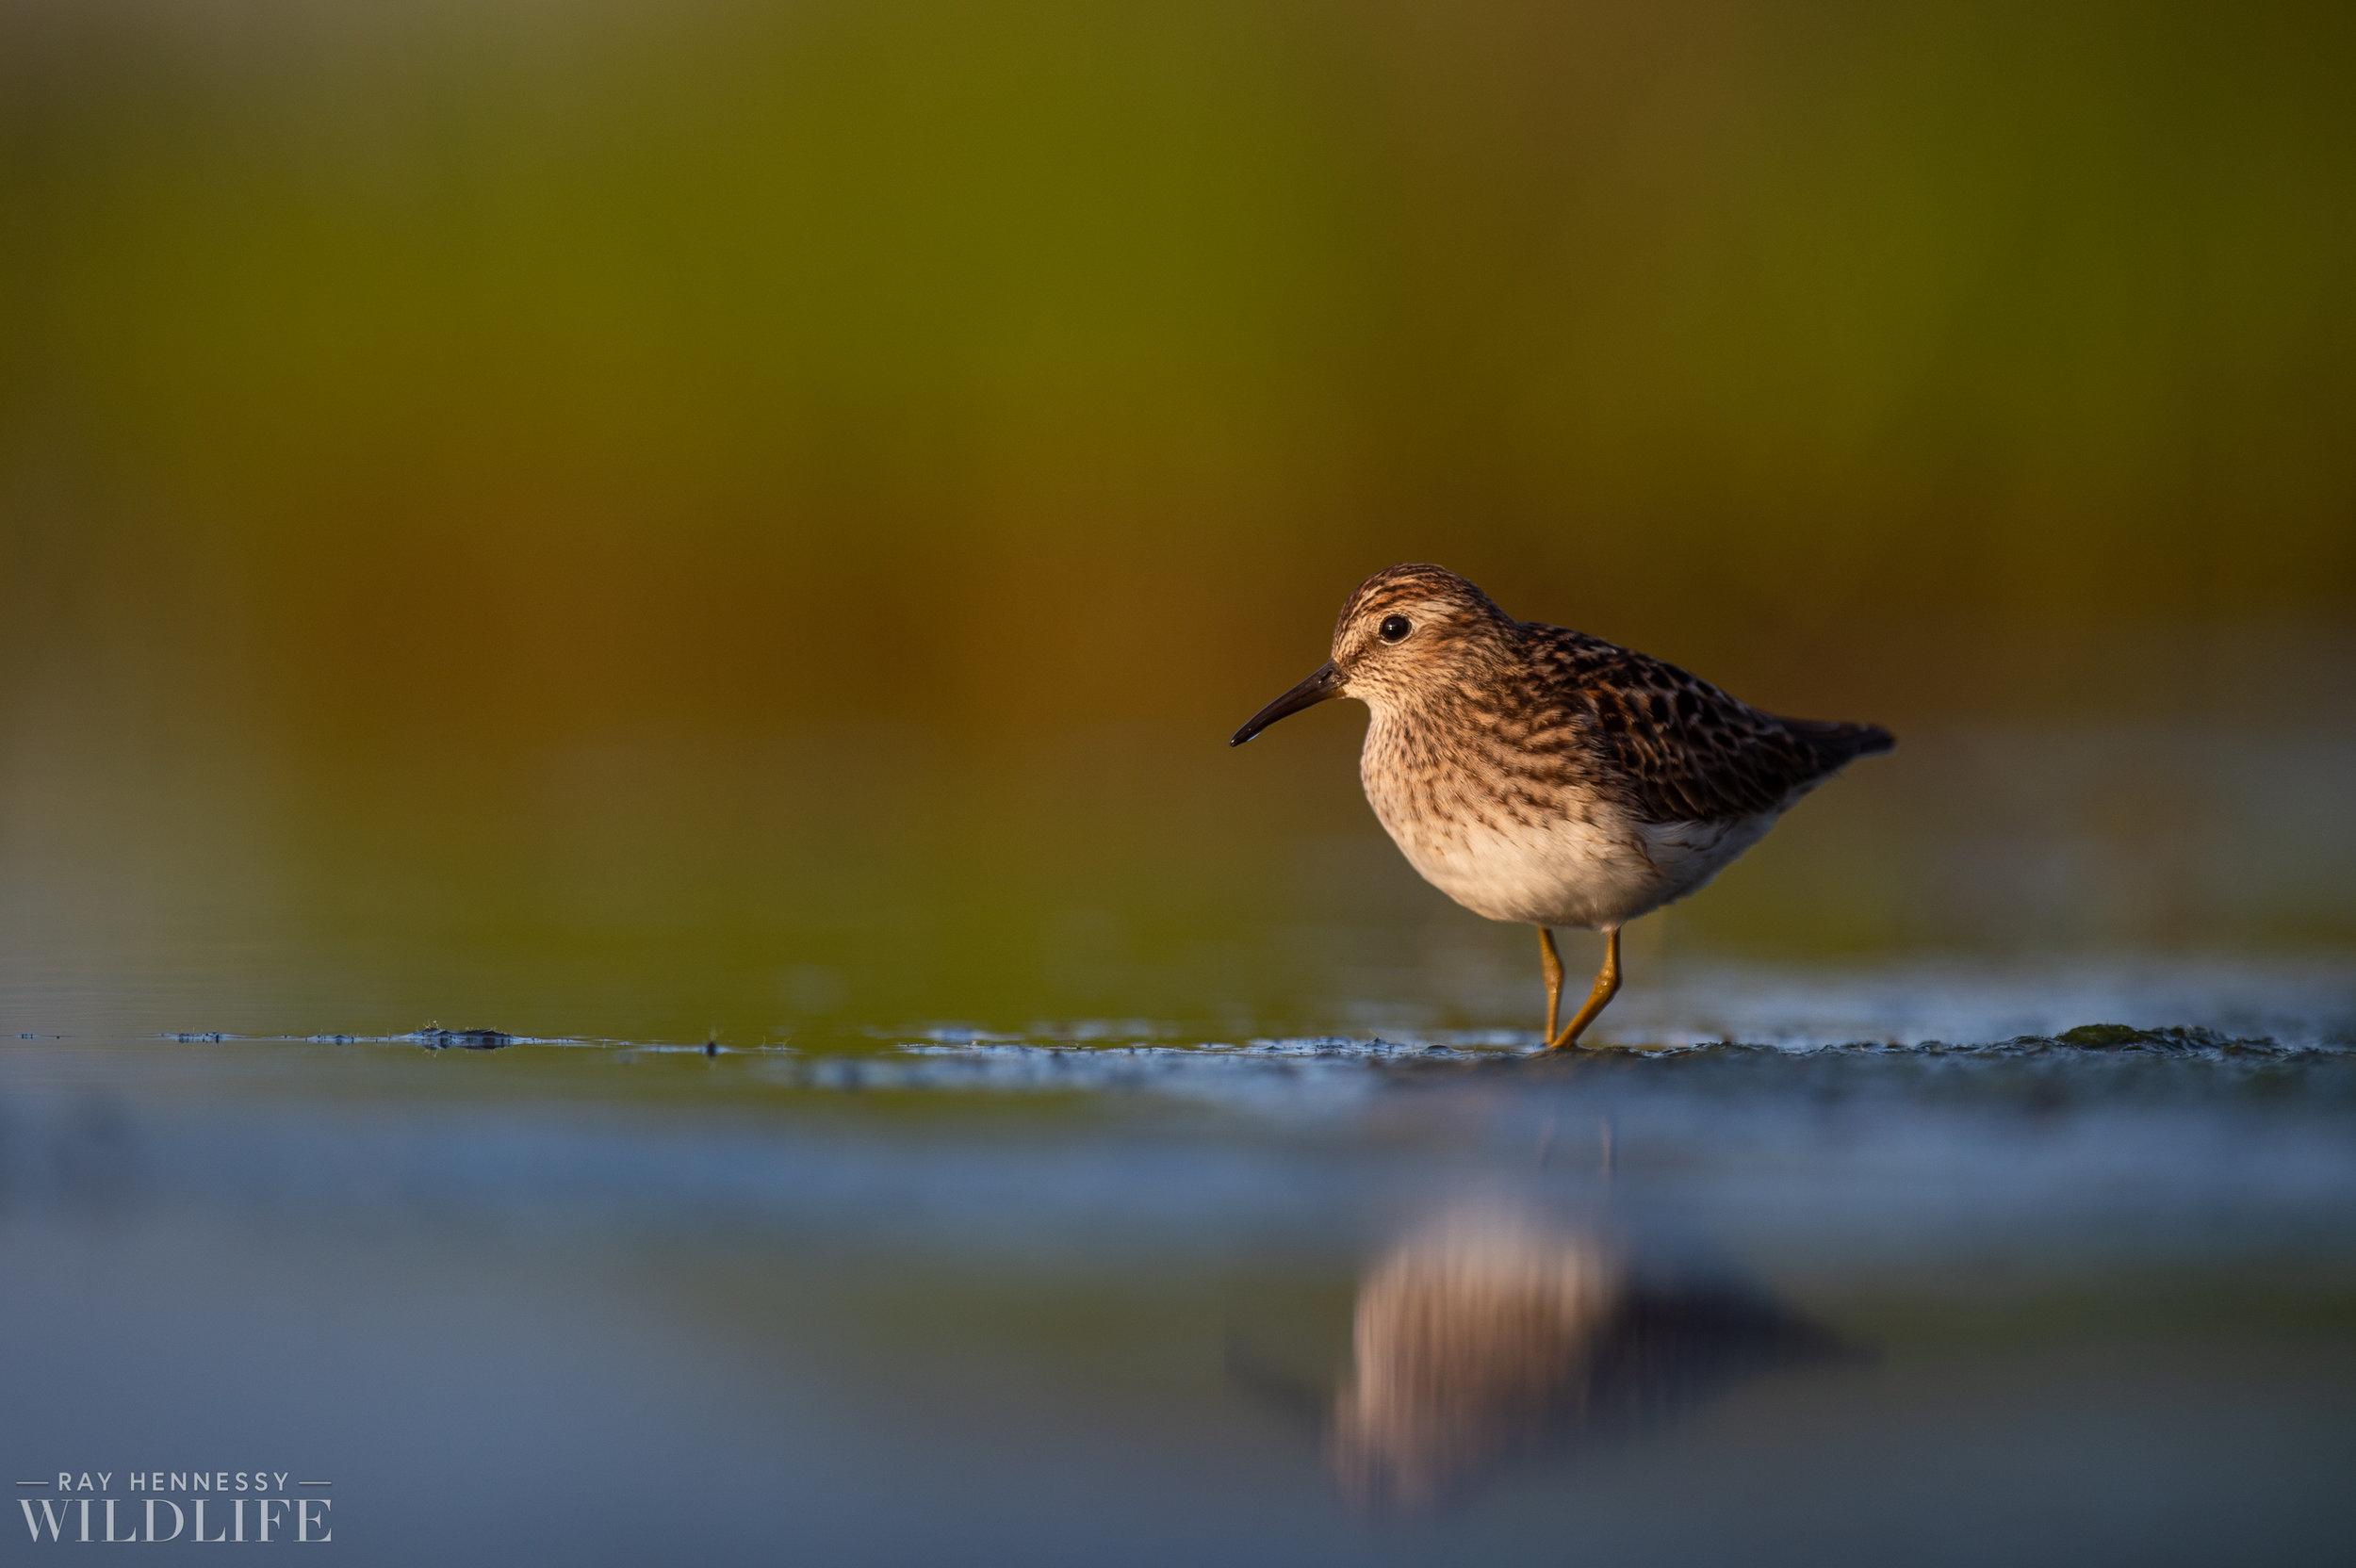 018_shorebirds-prothonotary-warbler.jpg